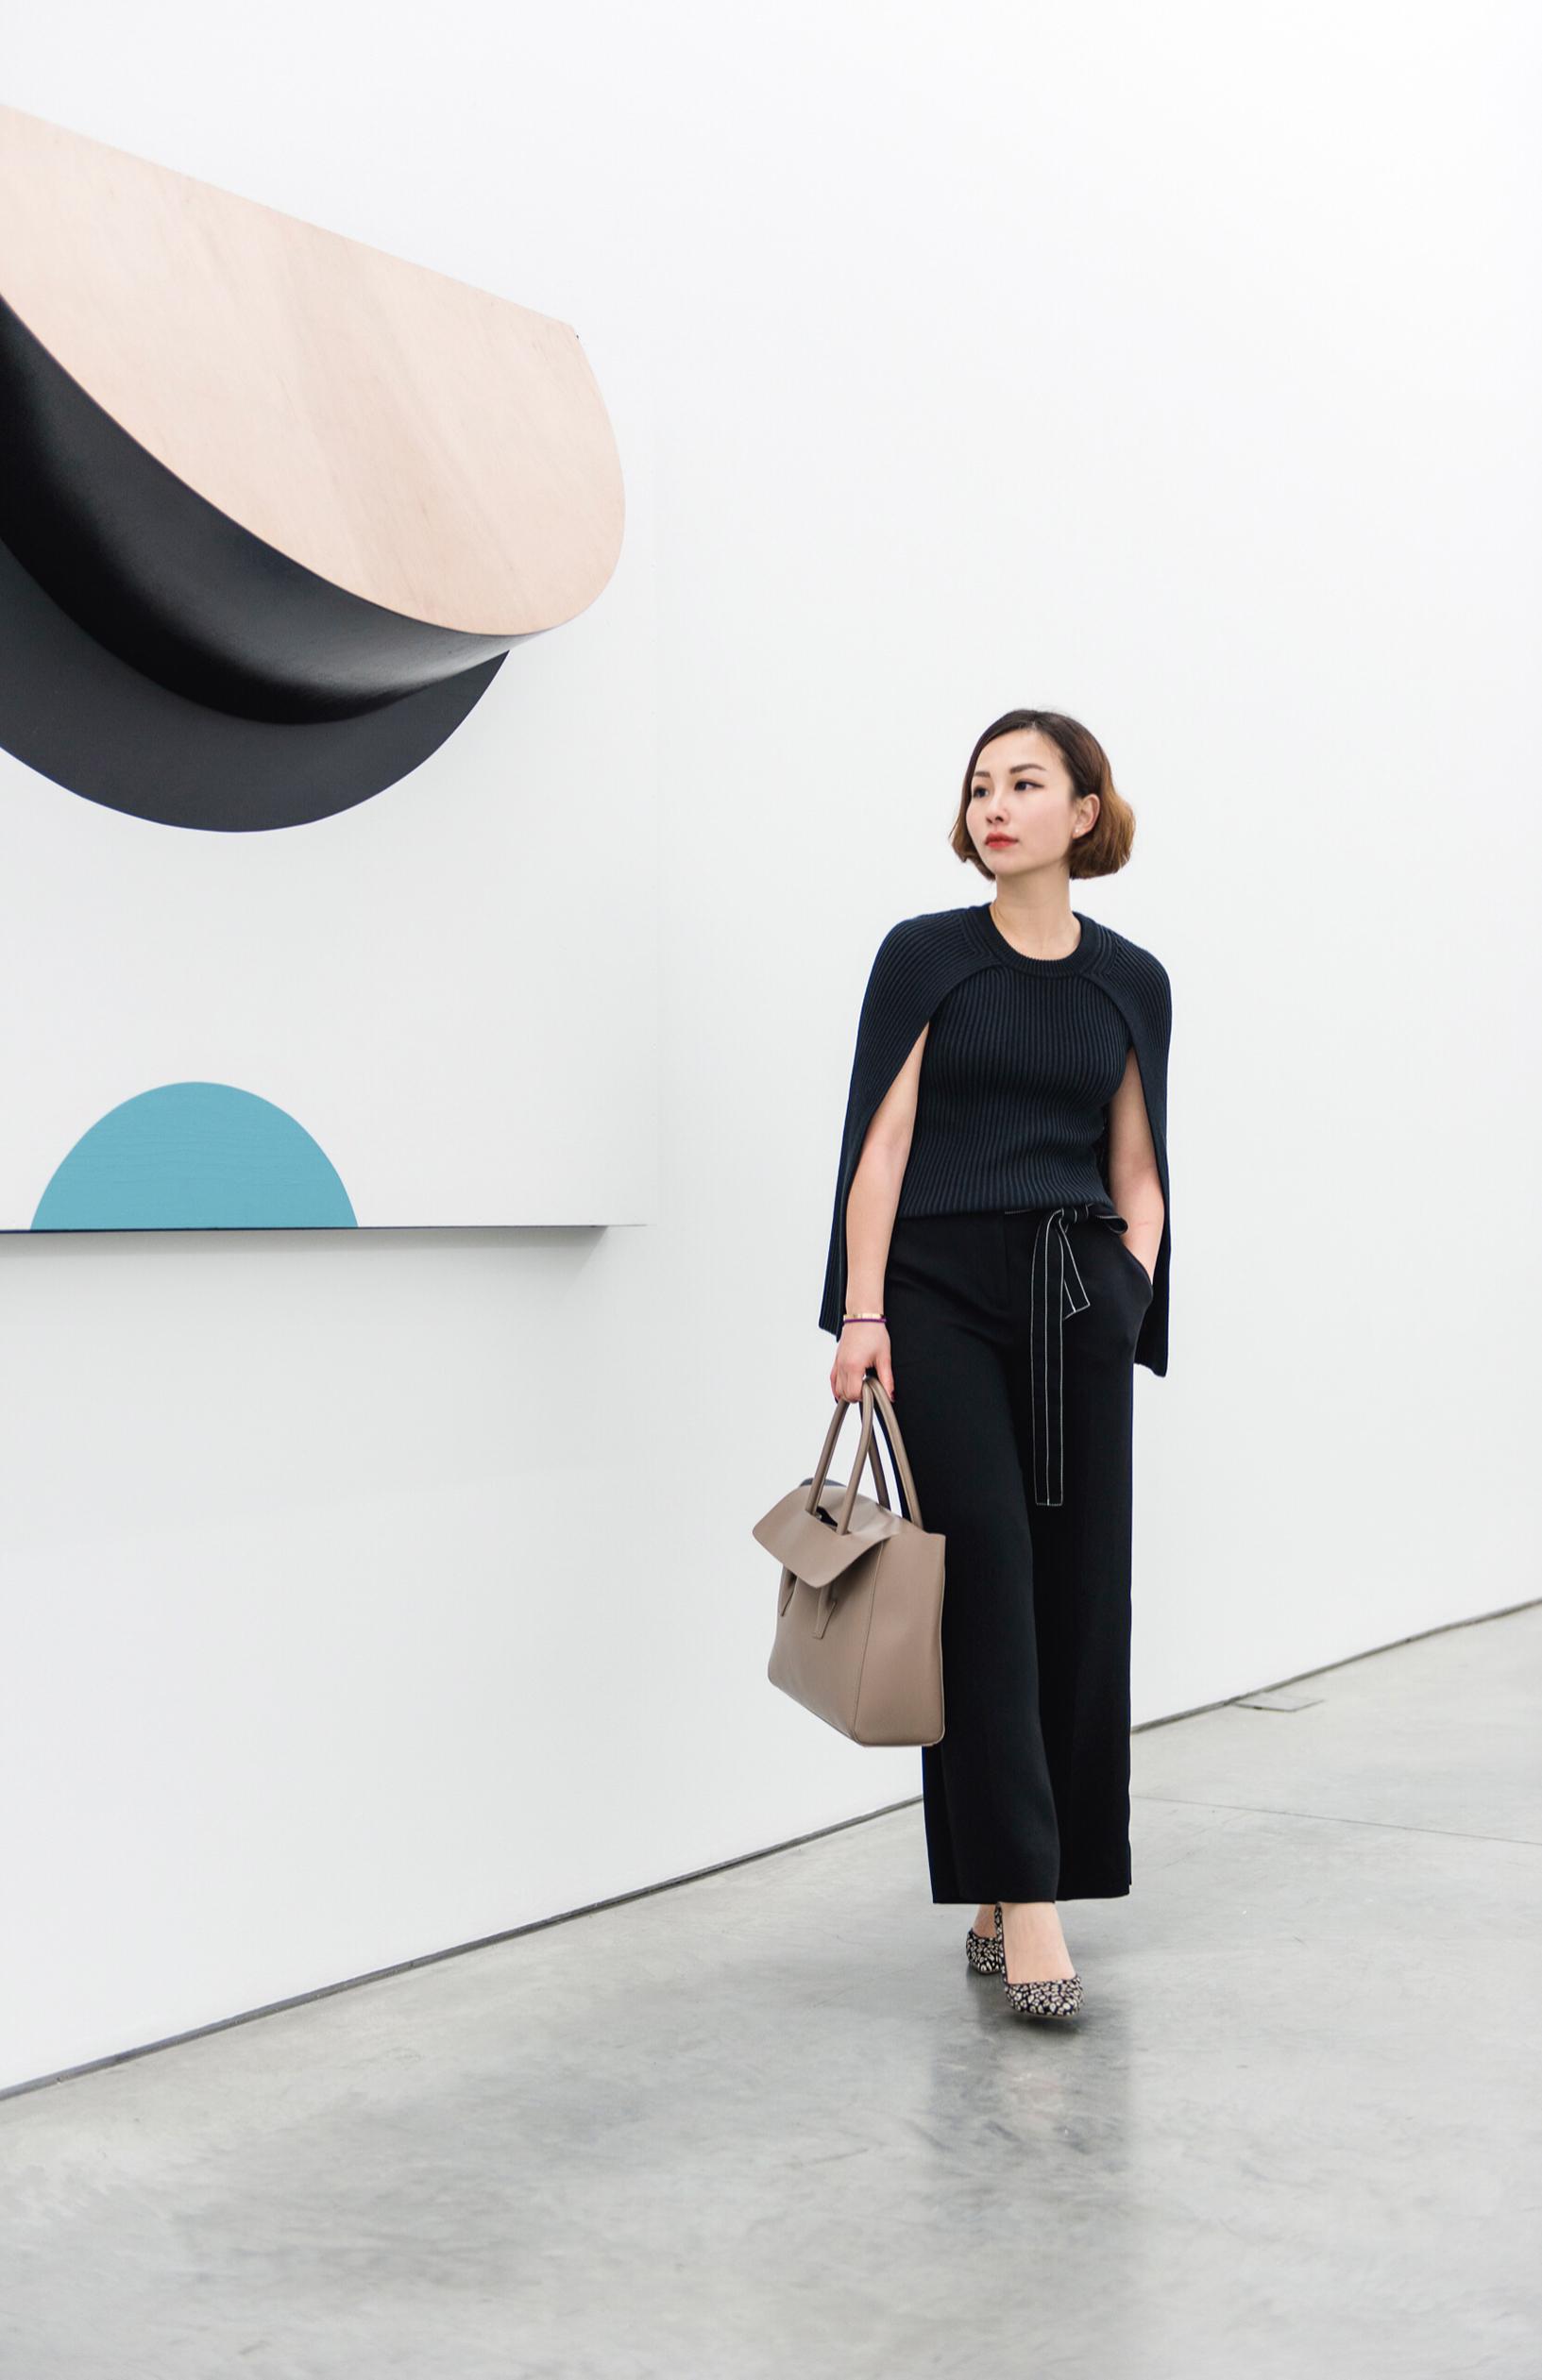 new york art gallery marianne boesky gallery 1.JPG